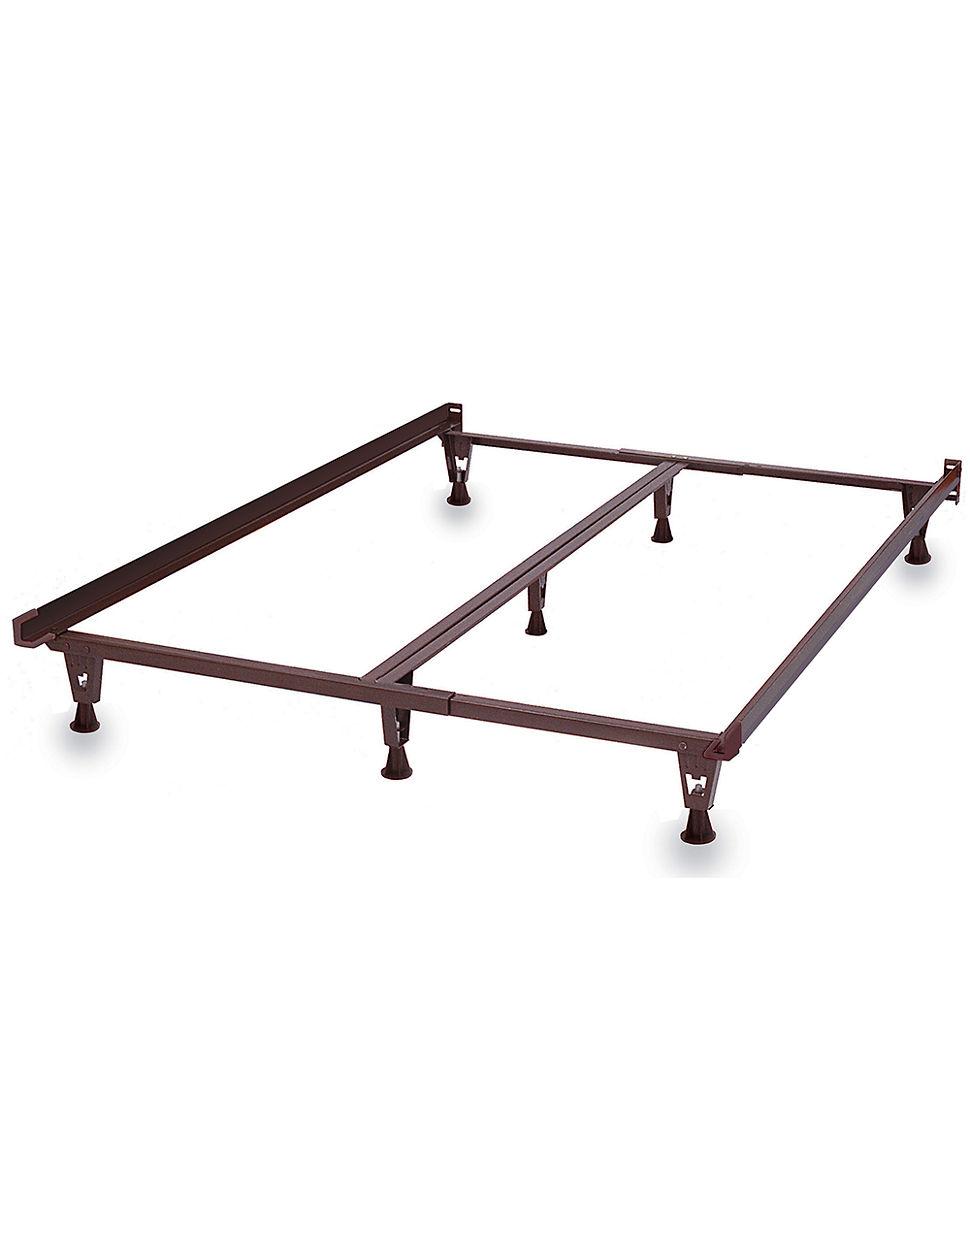 Knickerbocker Kb2007g Steel Monster Ultra Premium Adjustable Bed Frame Joshua Bate Trading Bermuda Ltd